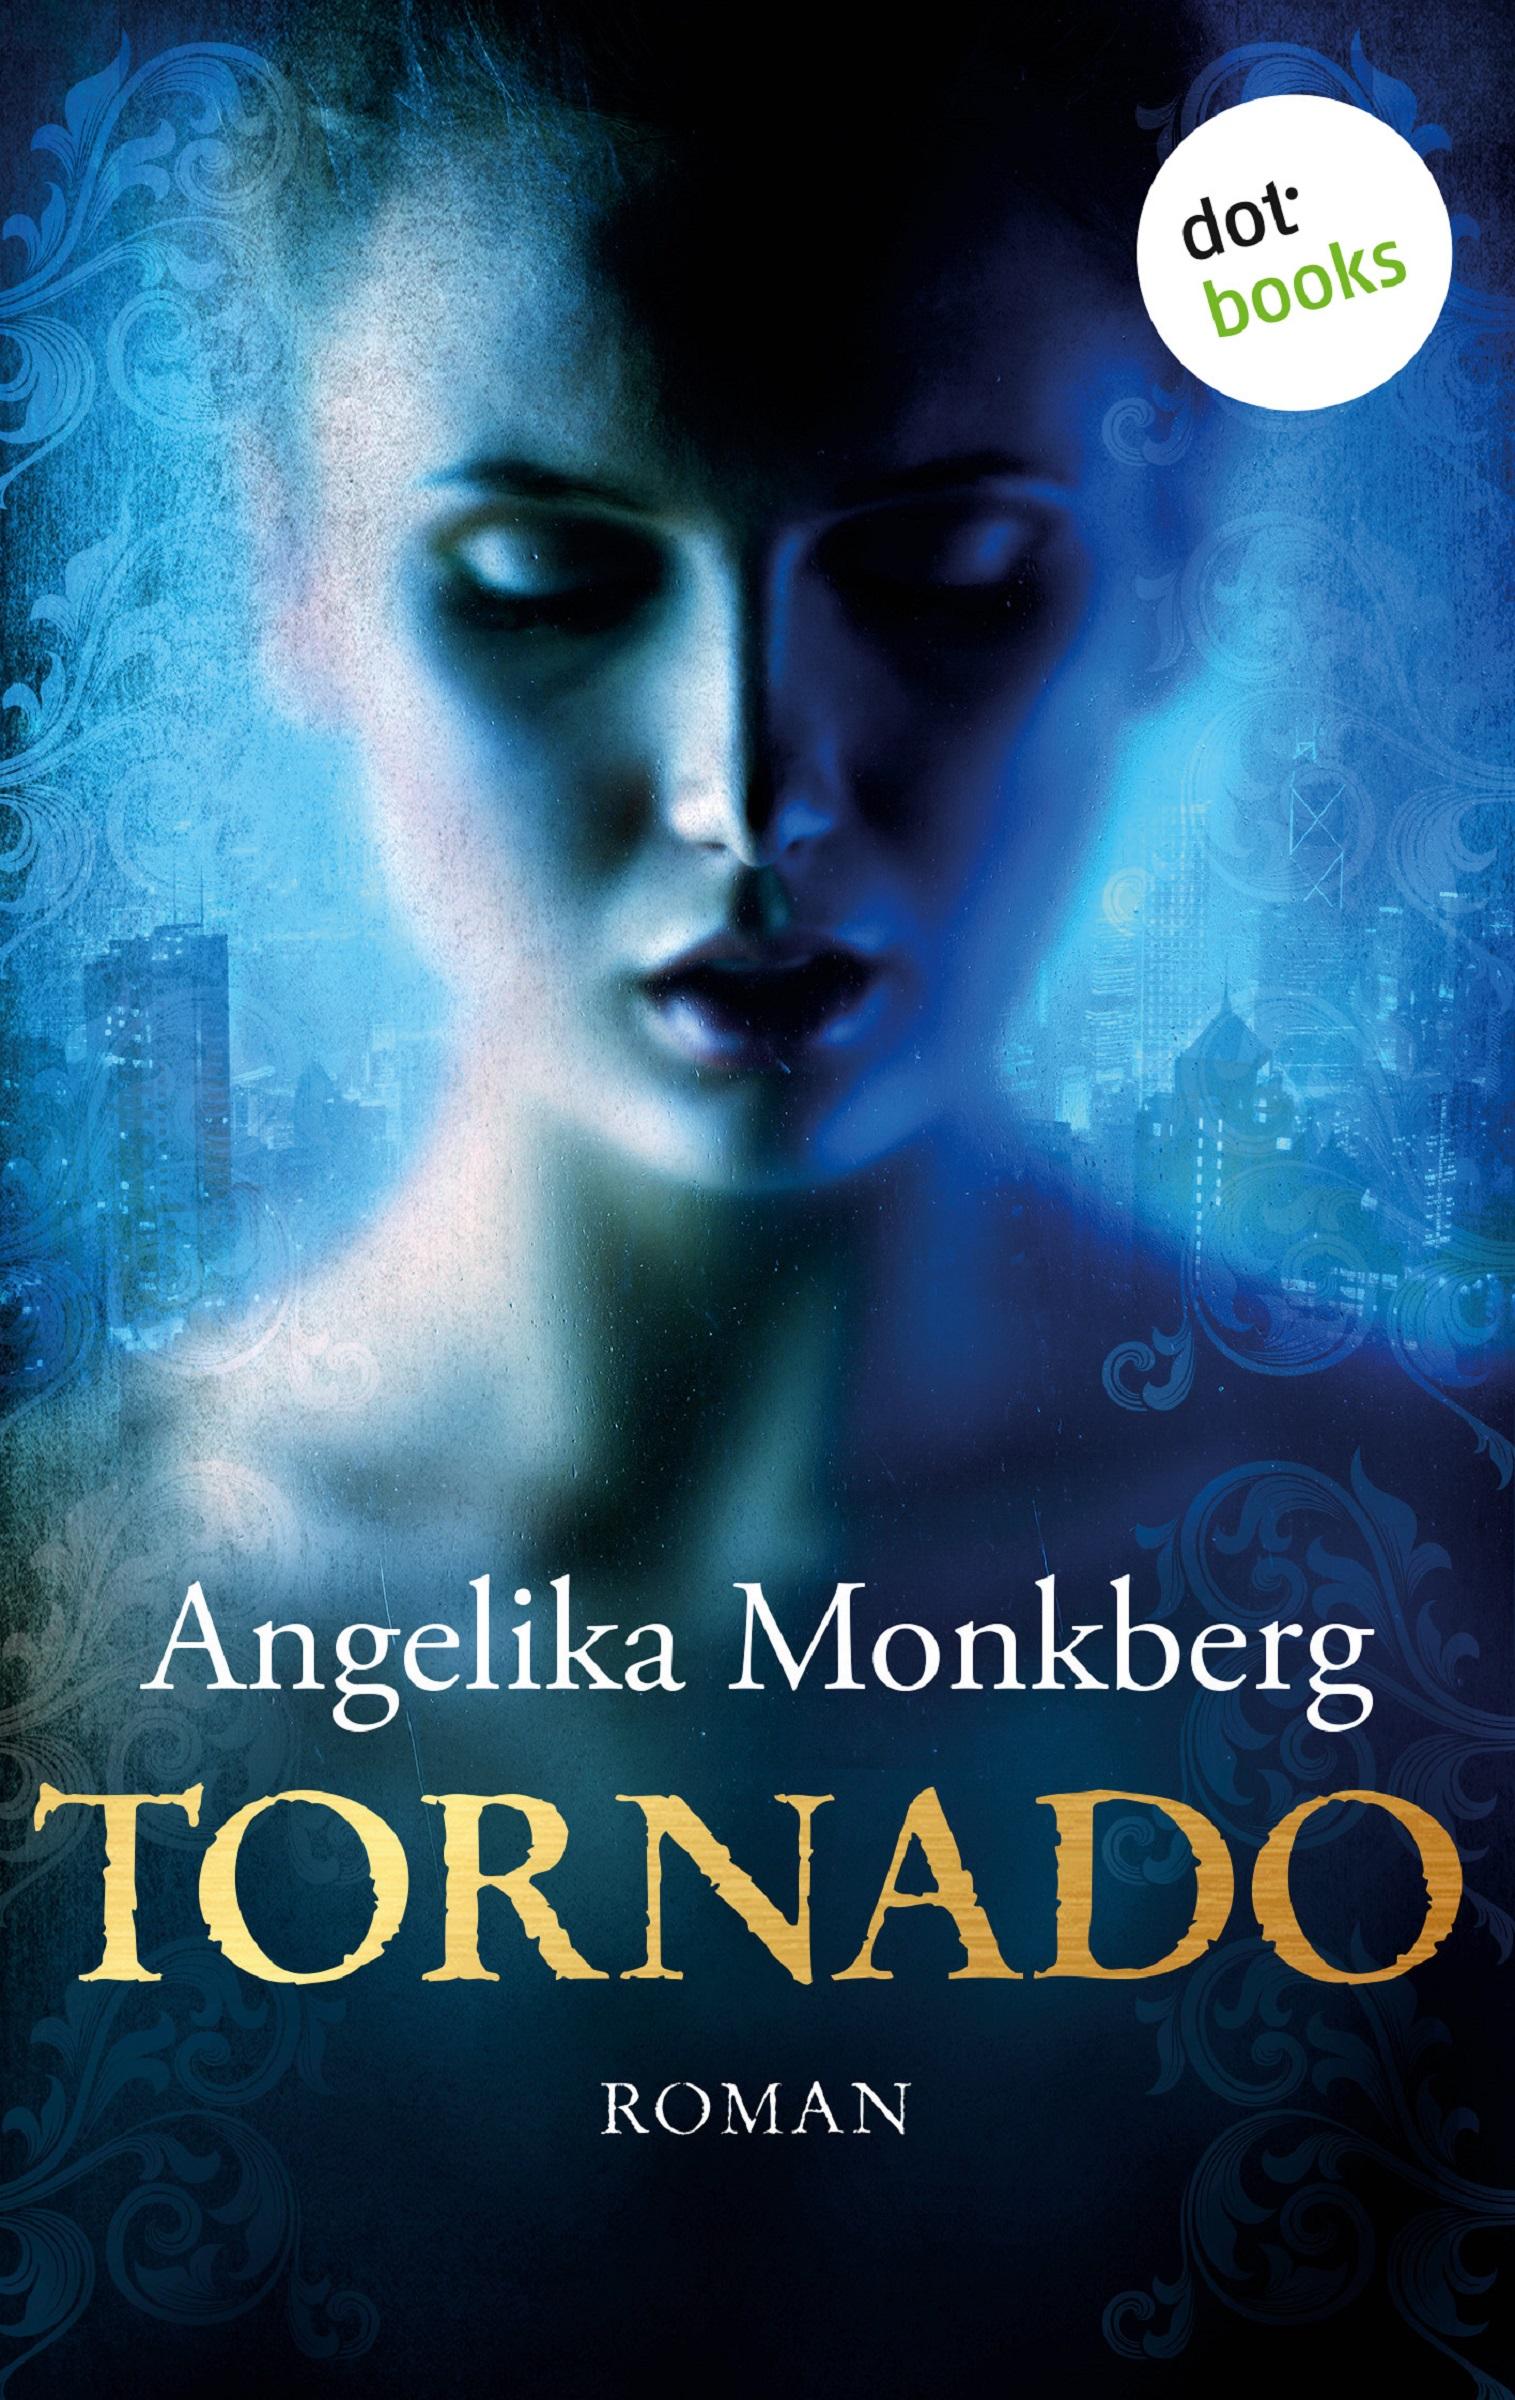 Monkberg_Angelika_Tornado_phantastik-autoren-netzwerk.jpg